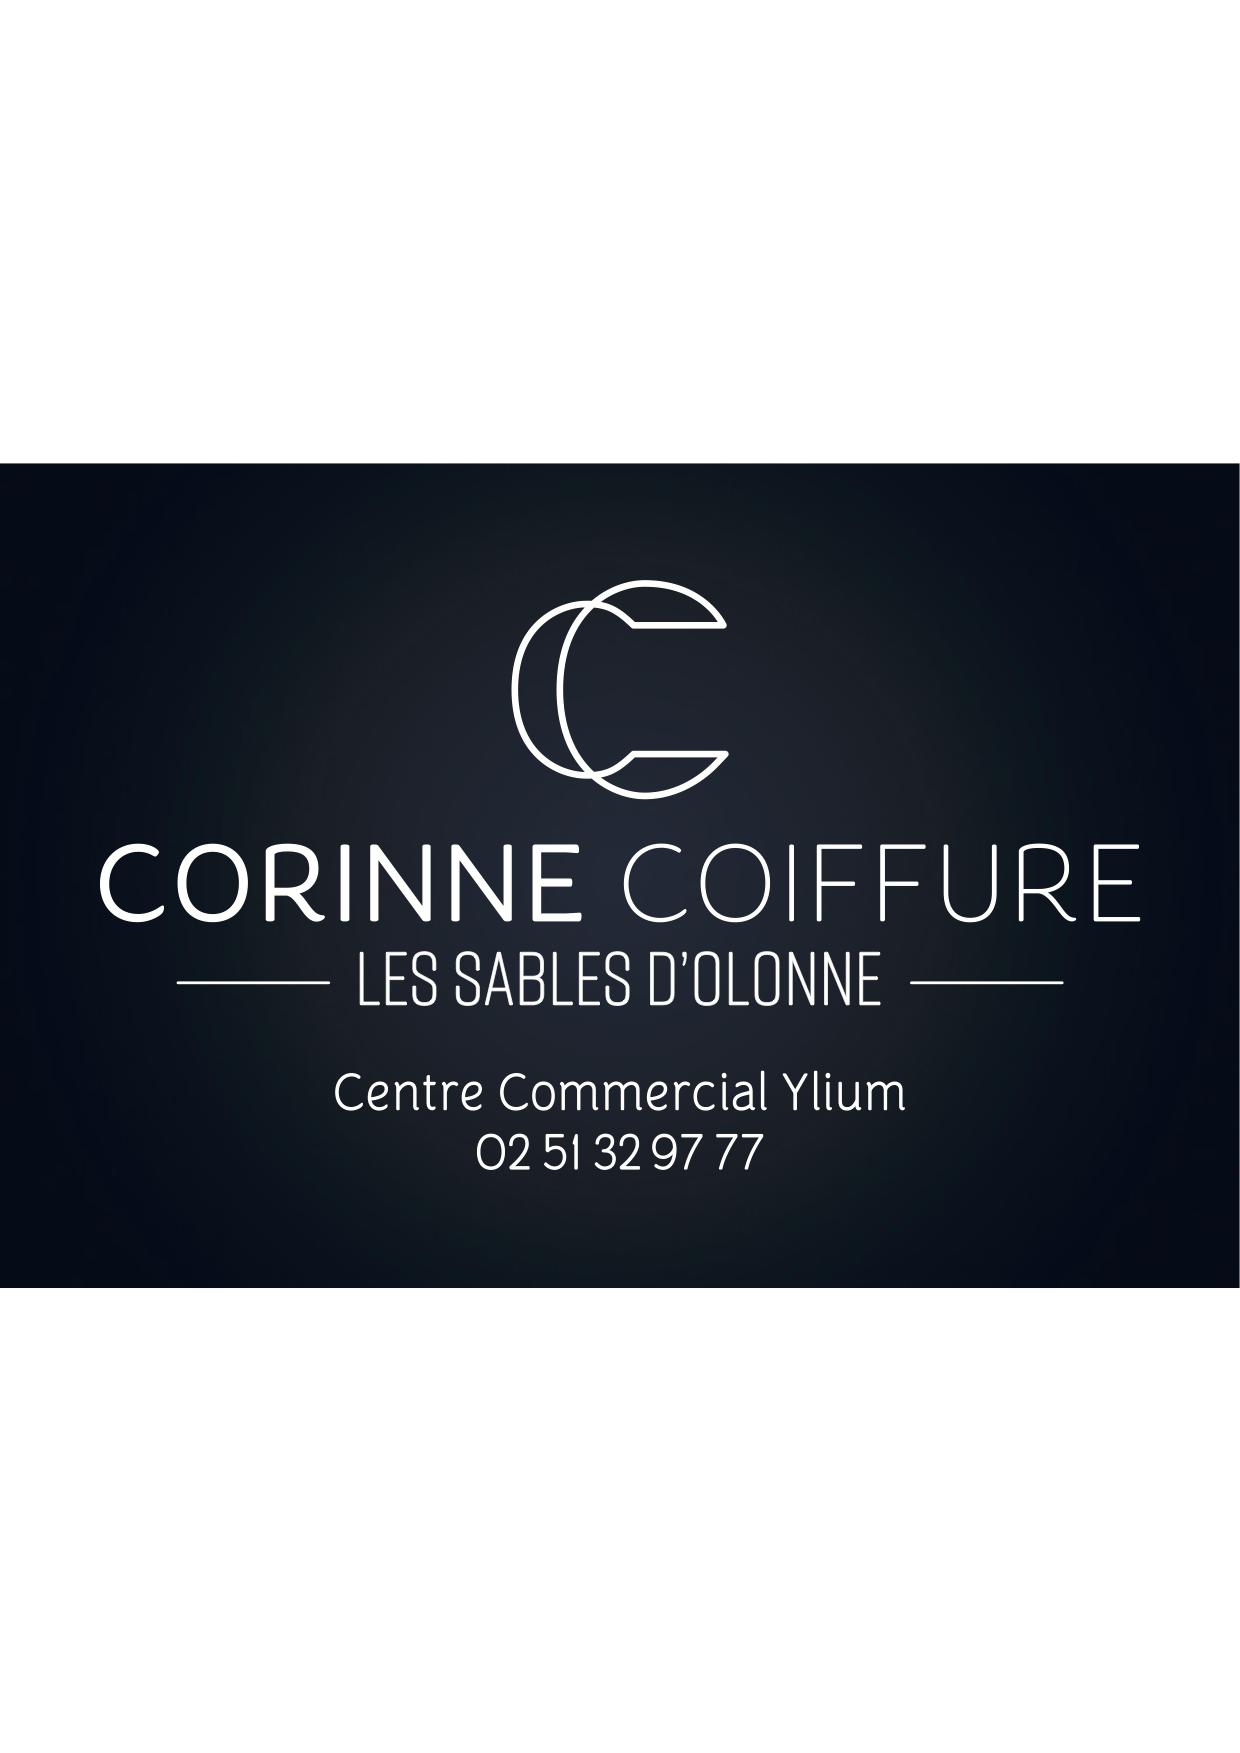 Corinne Coiffure